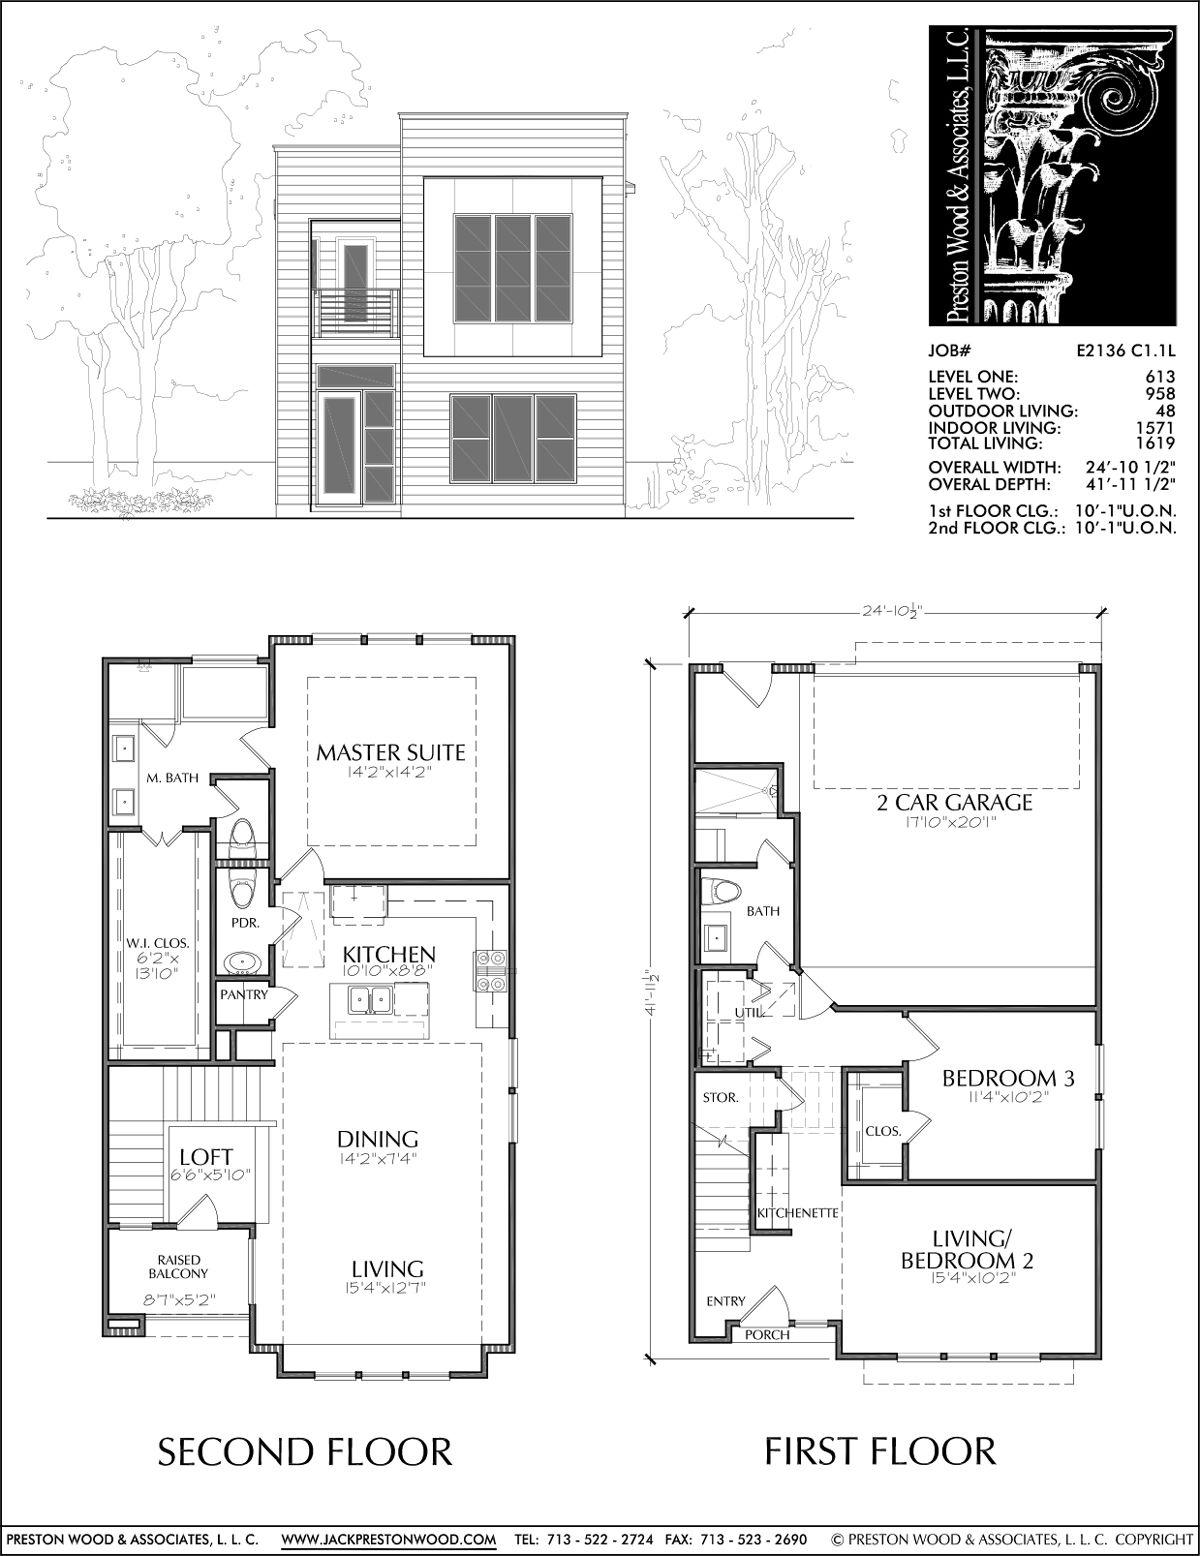 Townhouse Plan E2136 C1 1 Town House Floor Plan Narrow Lot House Plans House Floor Plans